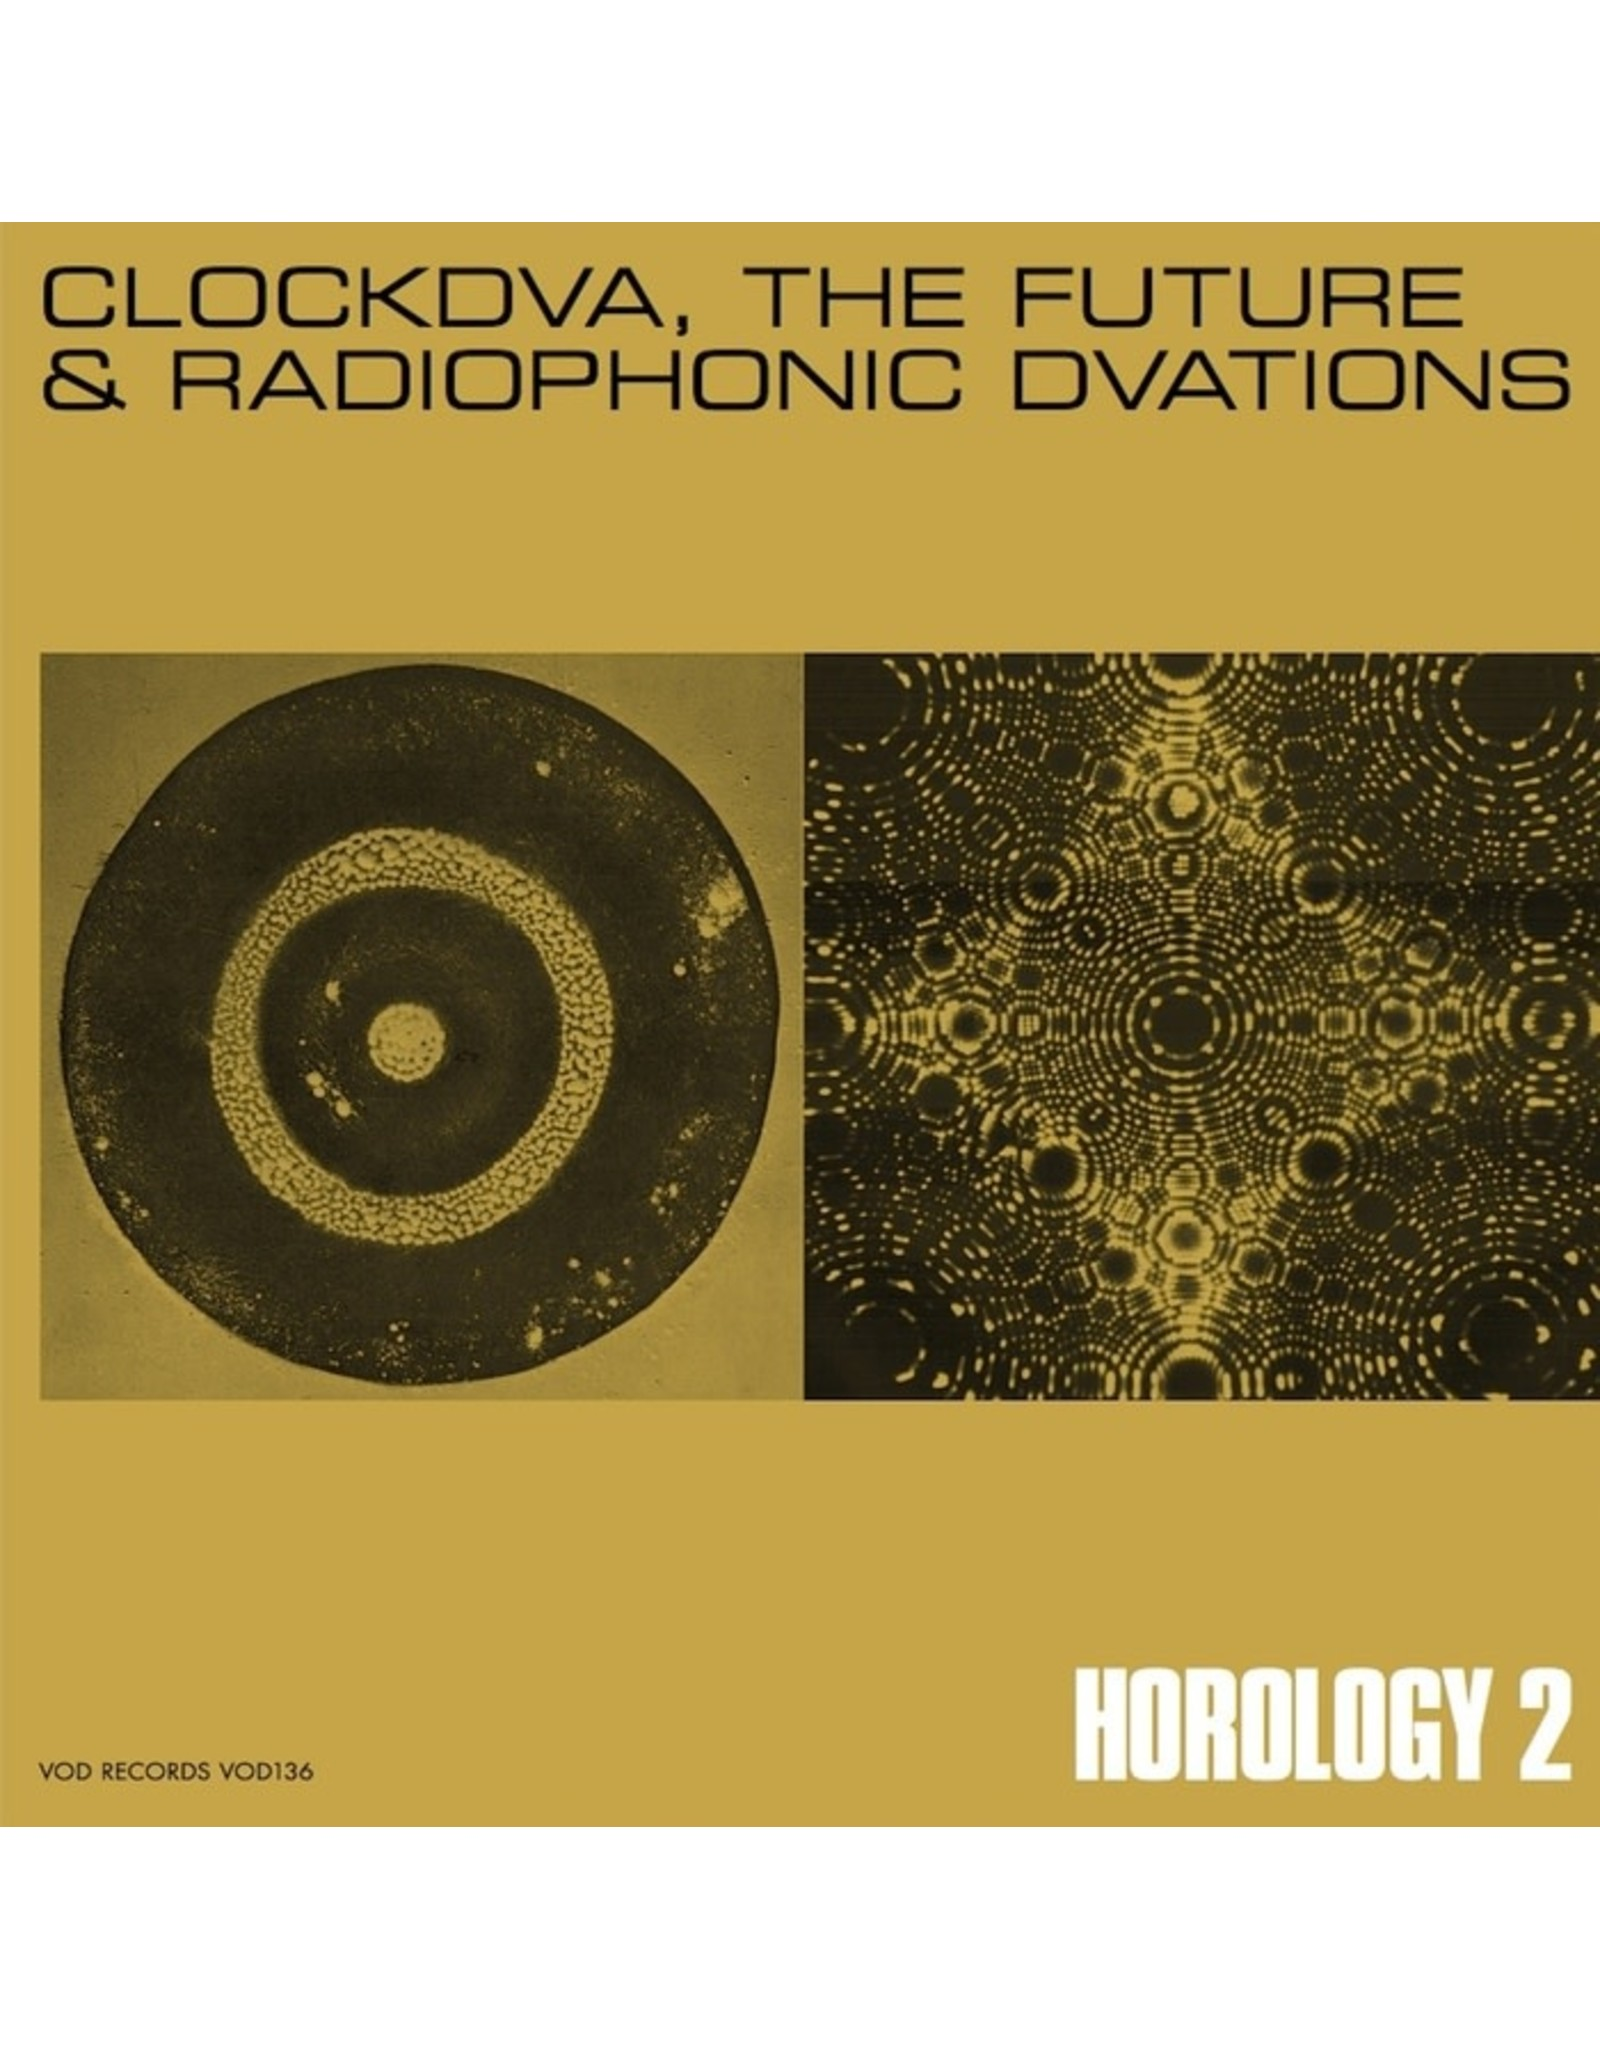 Vinyl on Demand Clock DVA: Horology 2 BOX